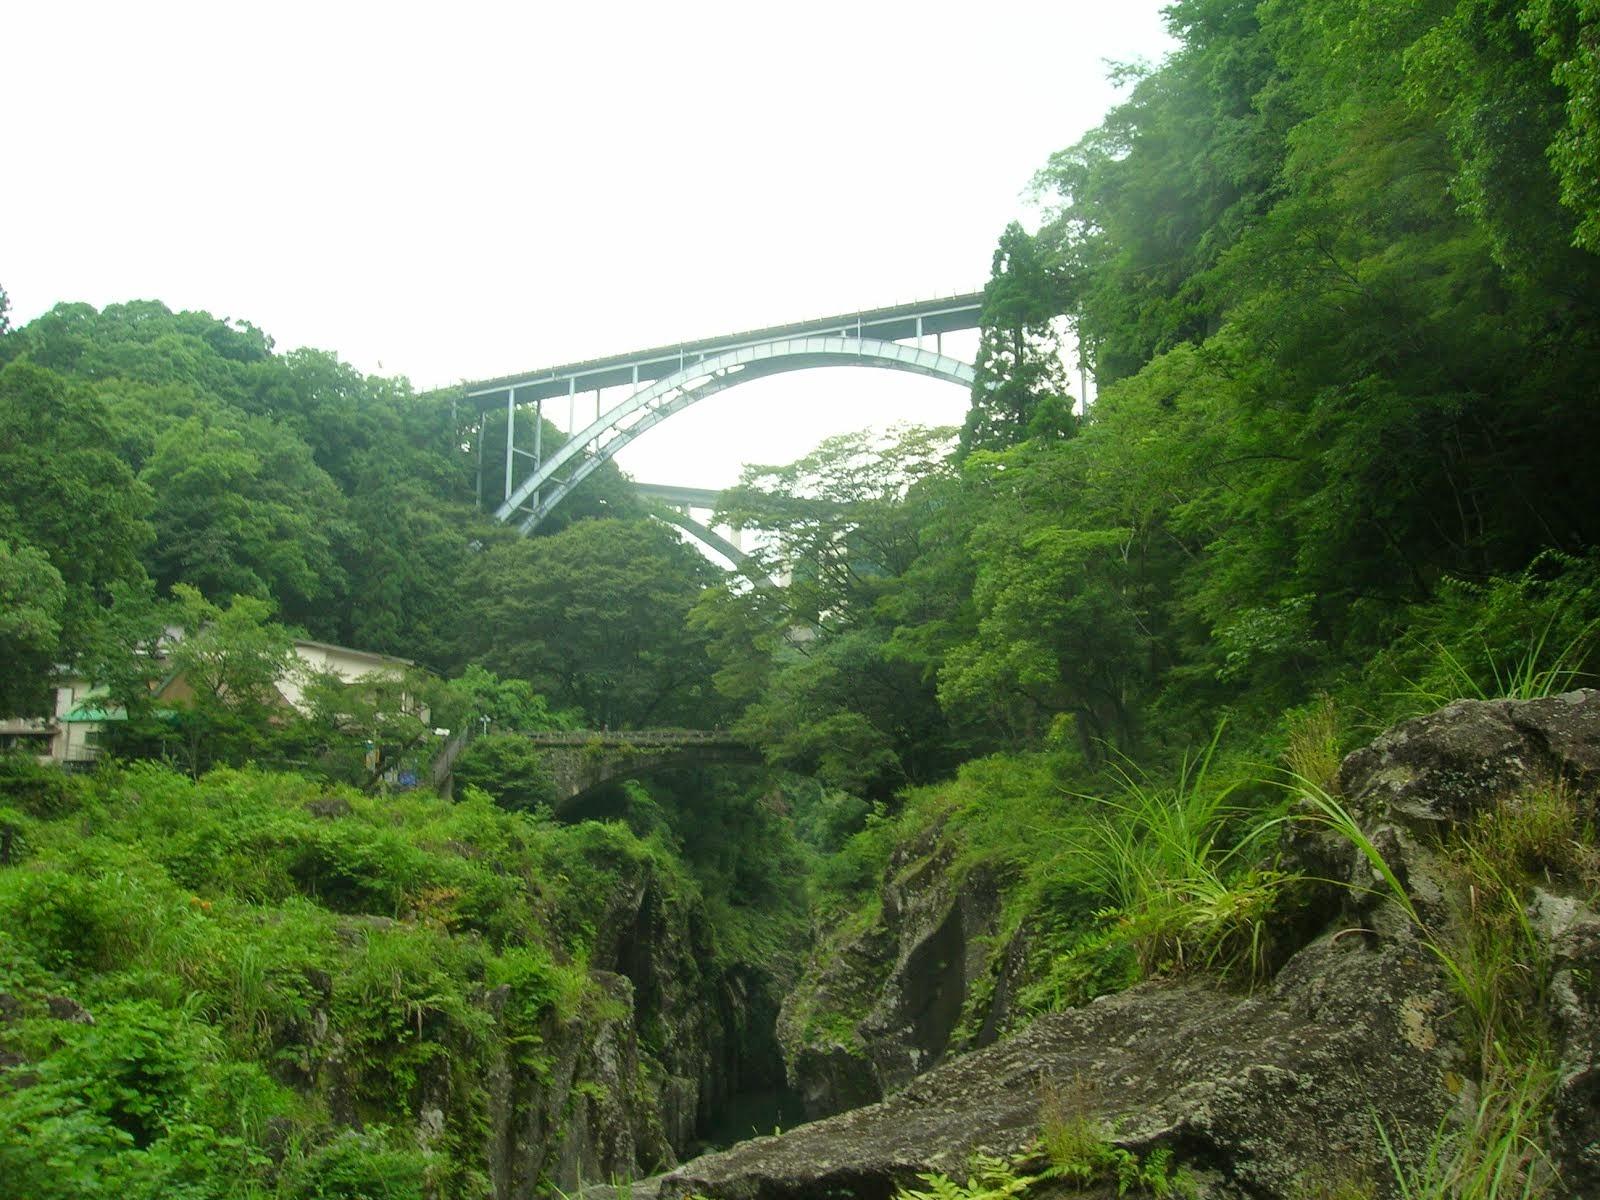 Magnificent Bridge over the gorge.